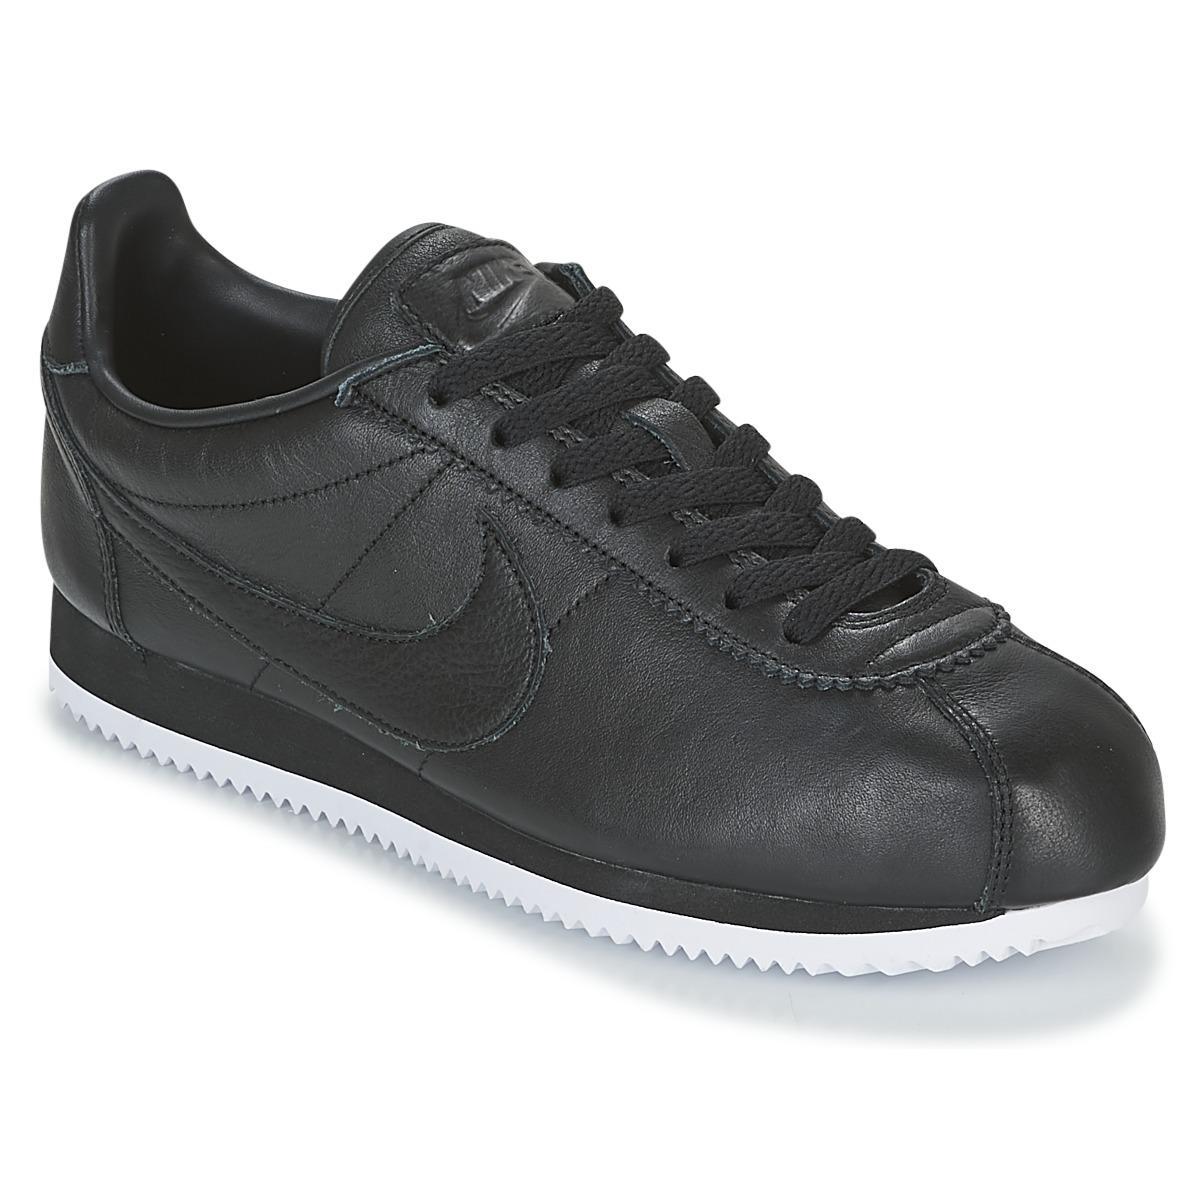 reputable site ce009 e40b6 ... canada nike classic cortez premium mens shoes trainers in black in  black f9713 65cb2 shopping nike air ...